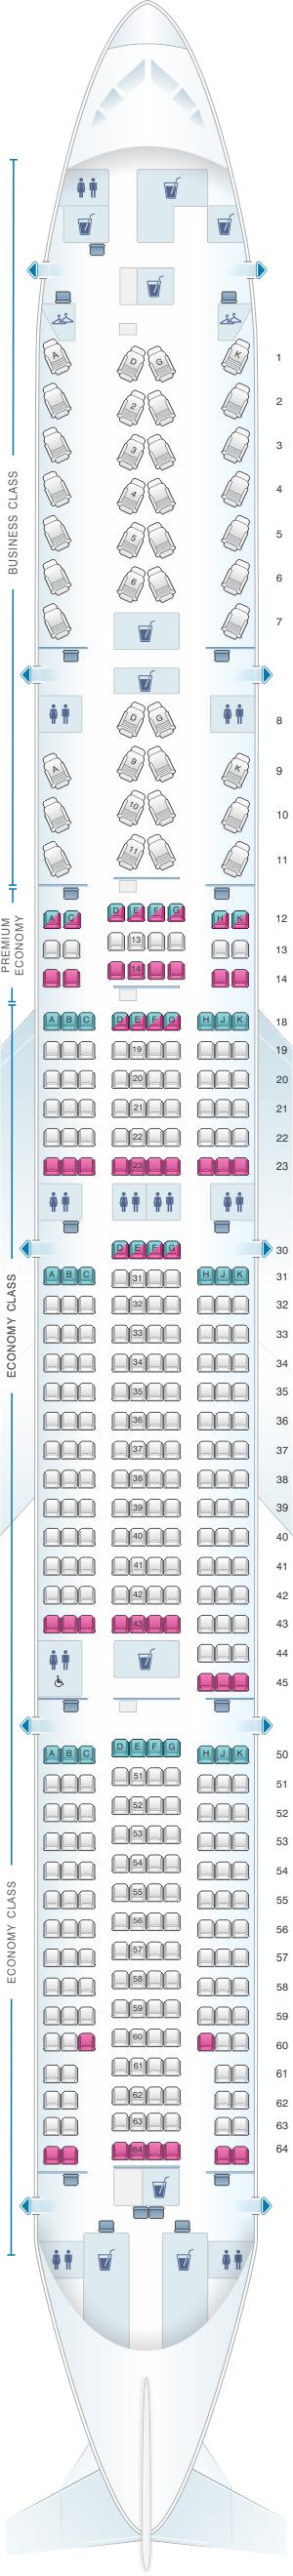 Plan de cabine air canada boeing b777 300er 77w for Plan cabine 777 300er